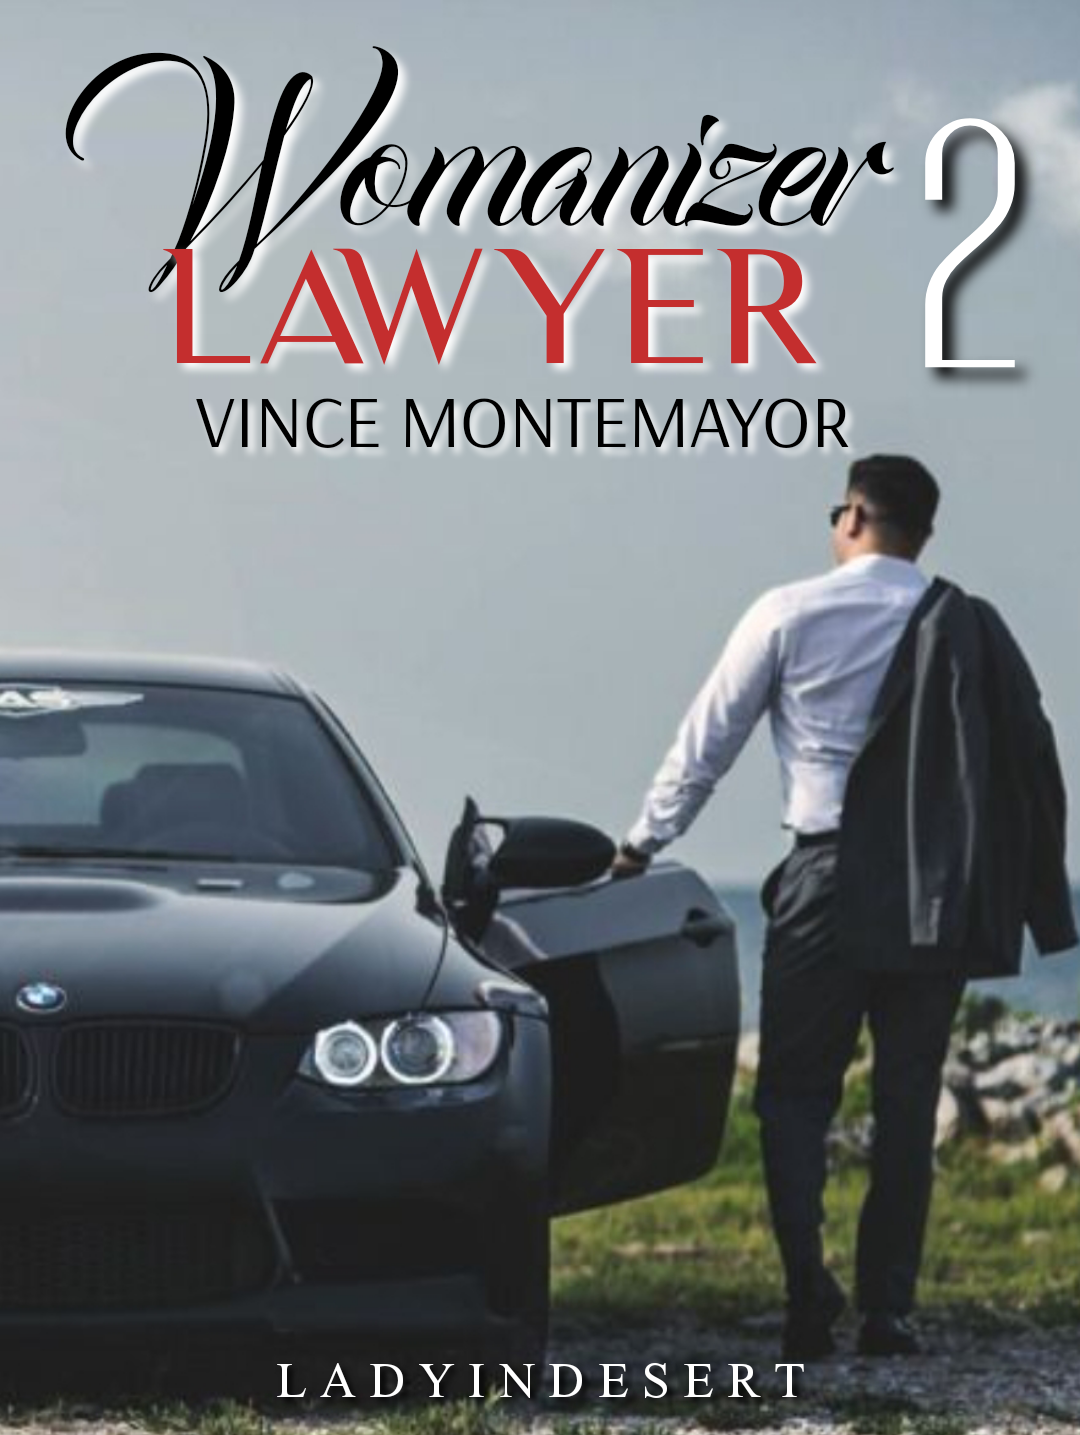 Womanizer LAWYER 2: VINCE MONTEMAYOR ( TAGALOG )